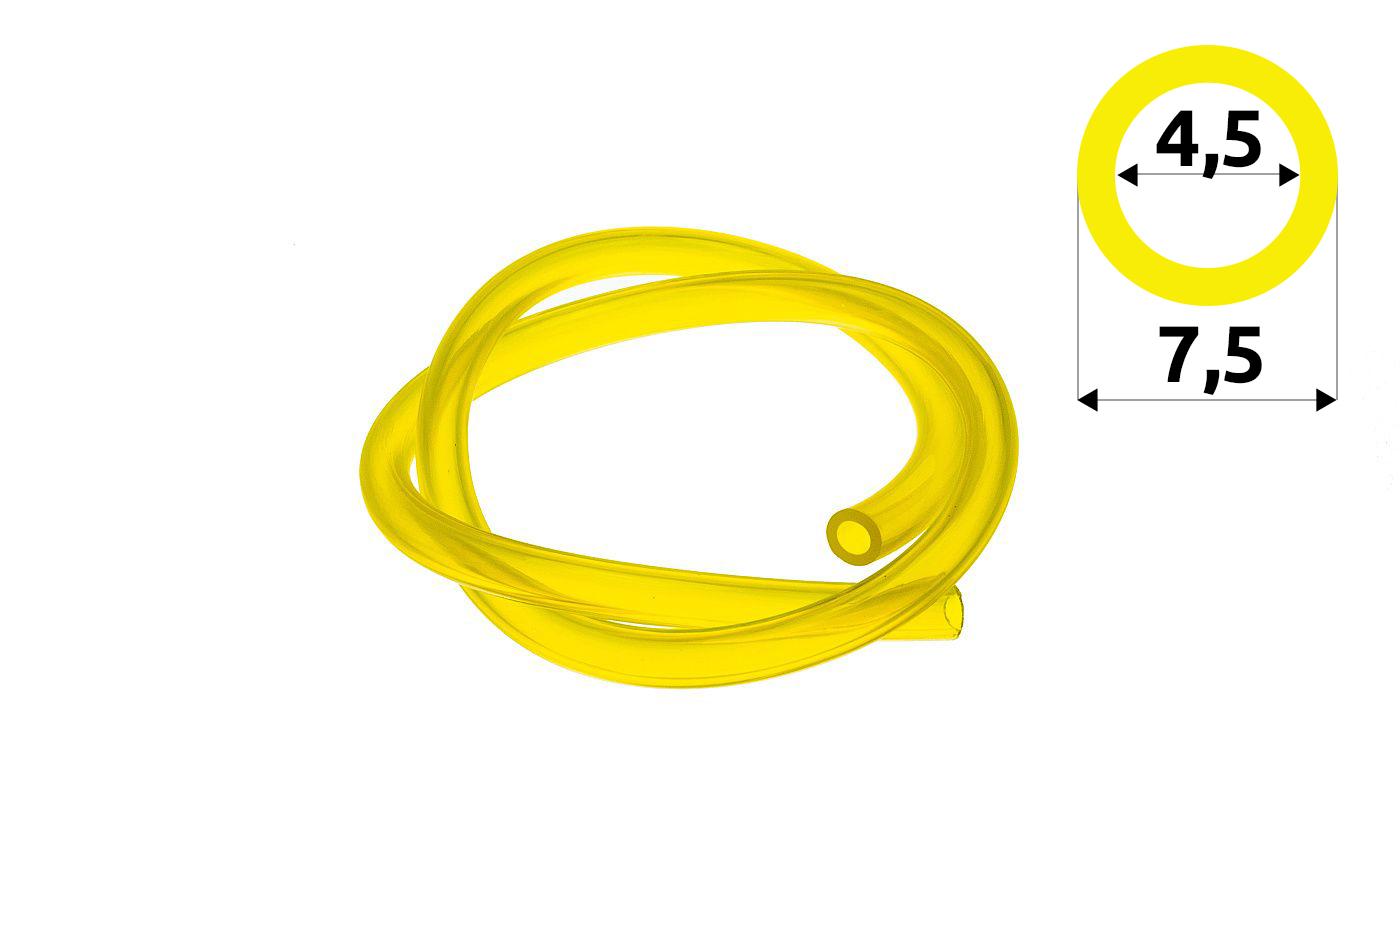 Palivová hadička 4,5 mm x 7,5 mm - 1 meter